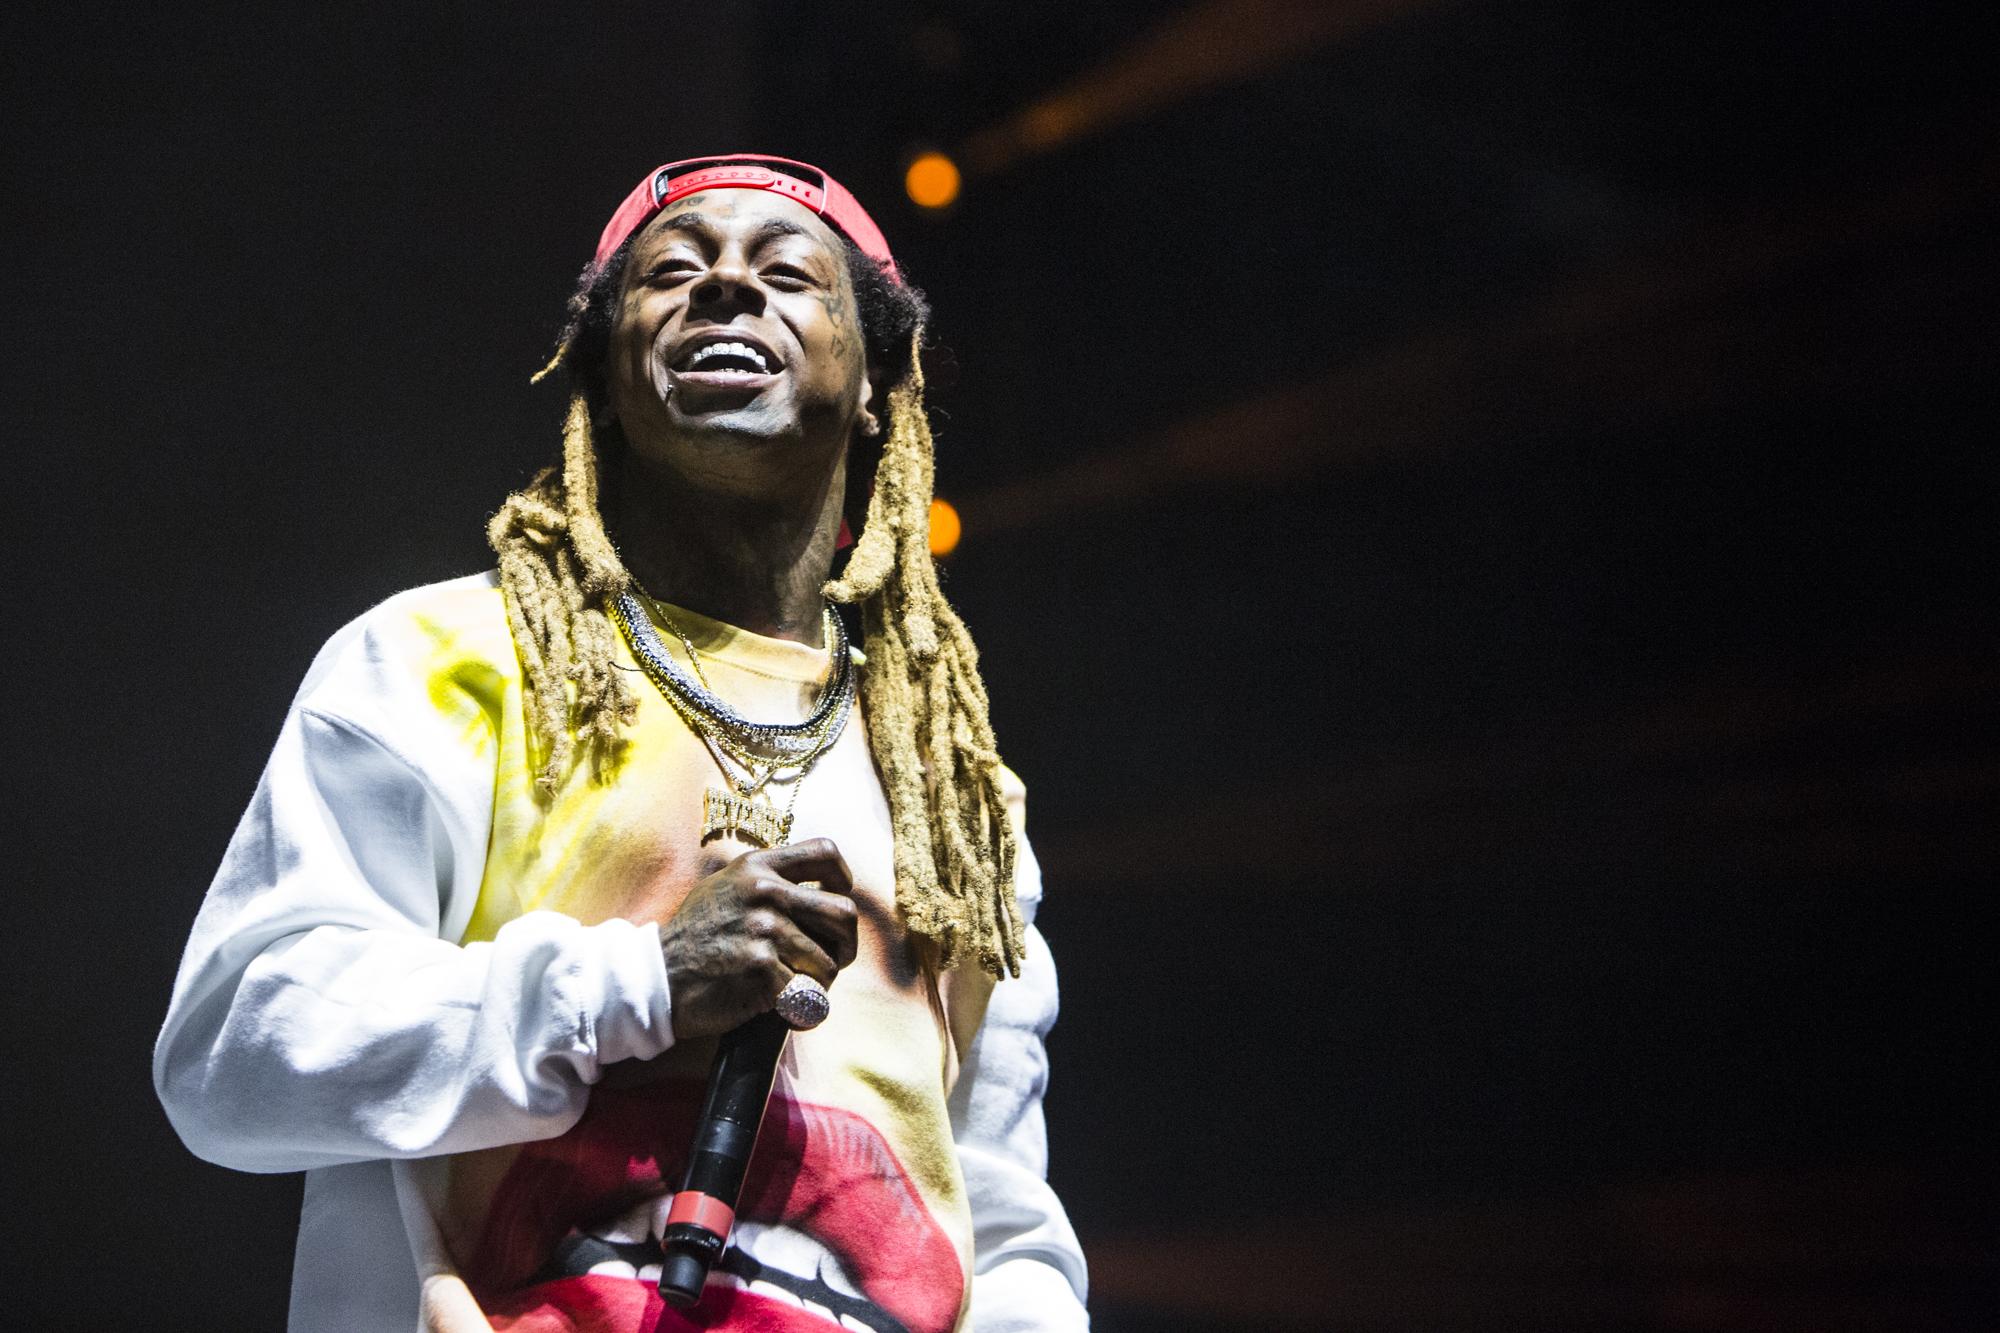 Lil Wayne // Photo by Philip Cosores